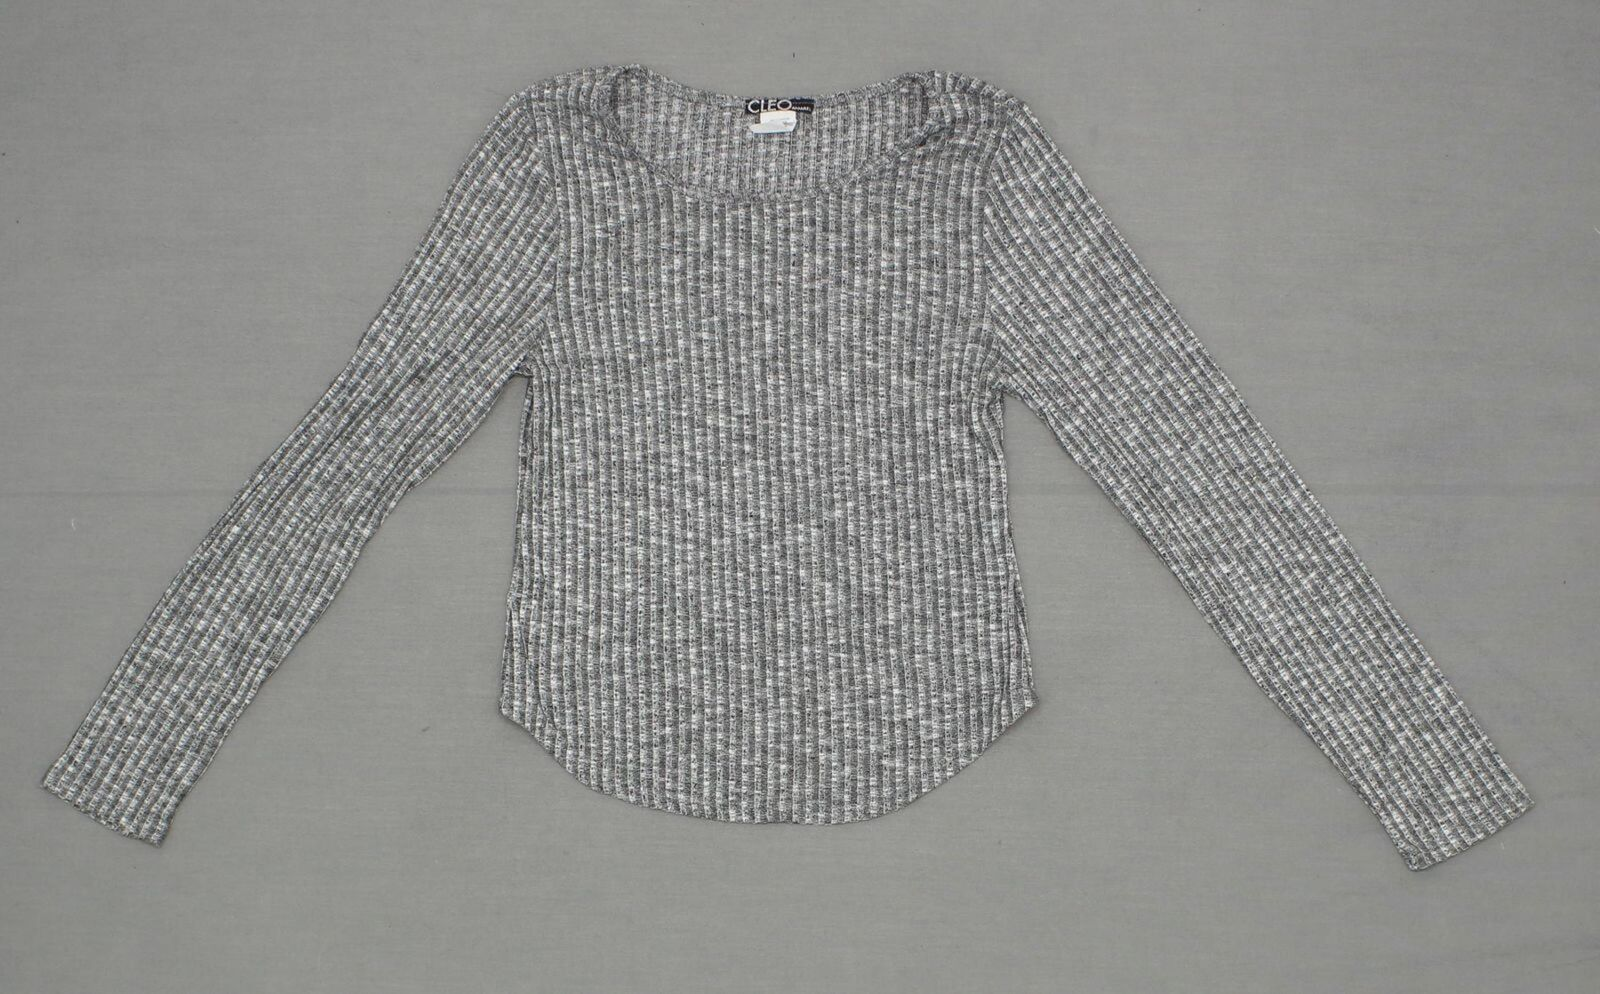 new Cleo Women's Long Sleeve Lo Hi Knit Top Blouse Shirt